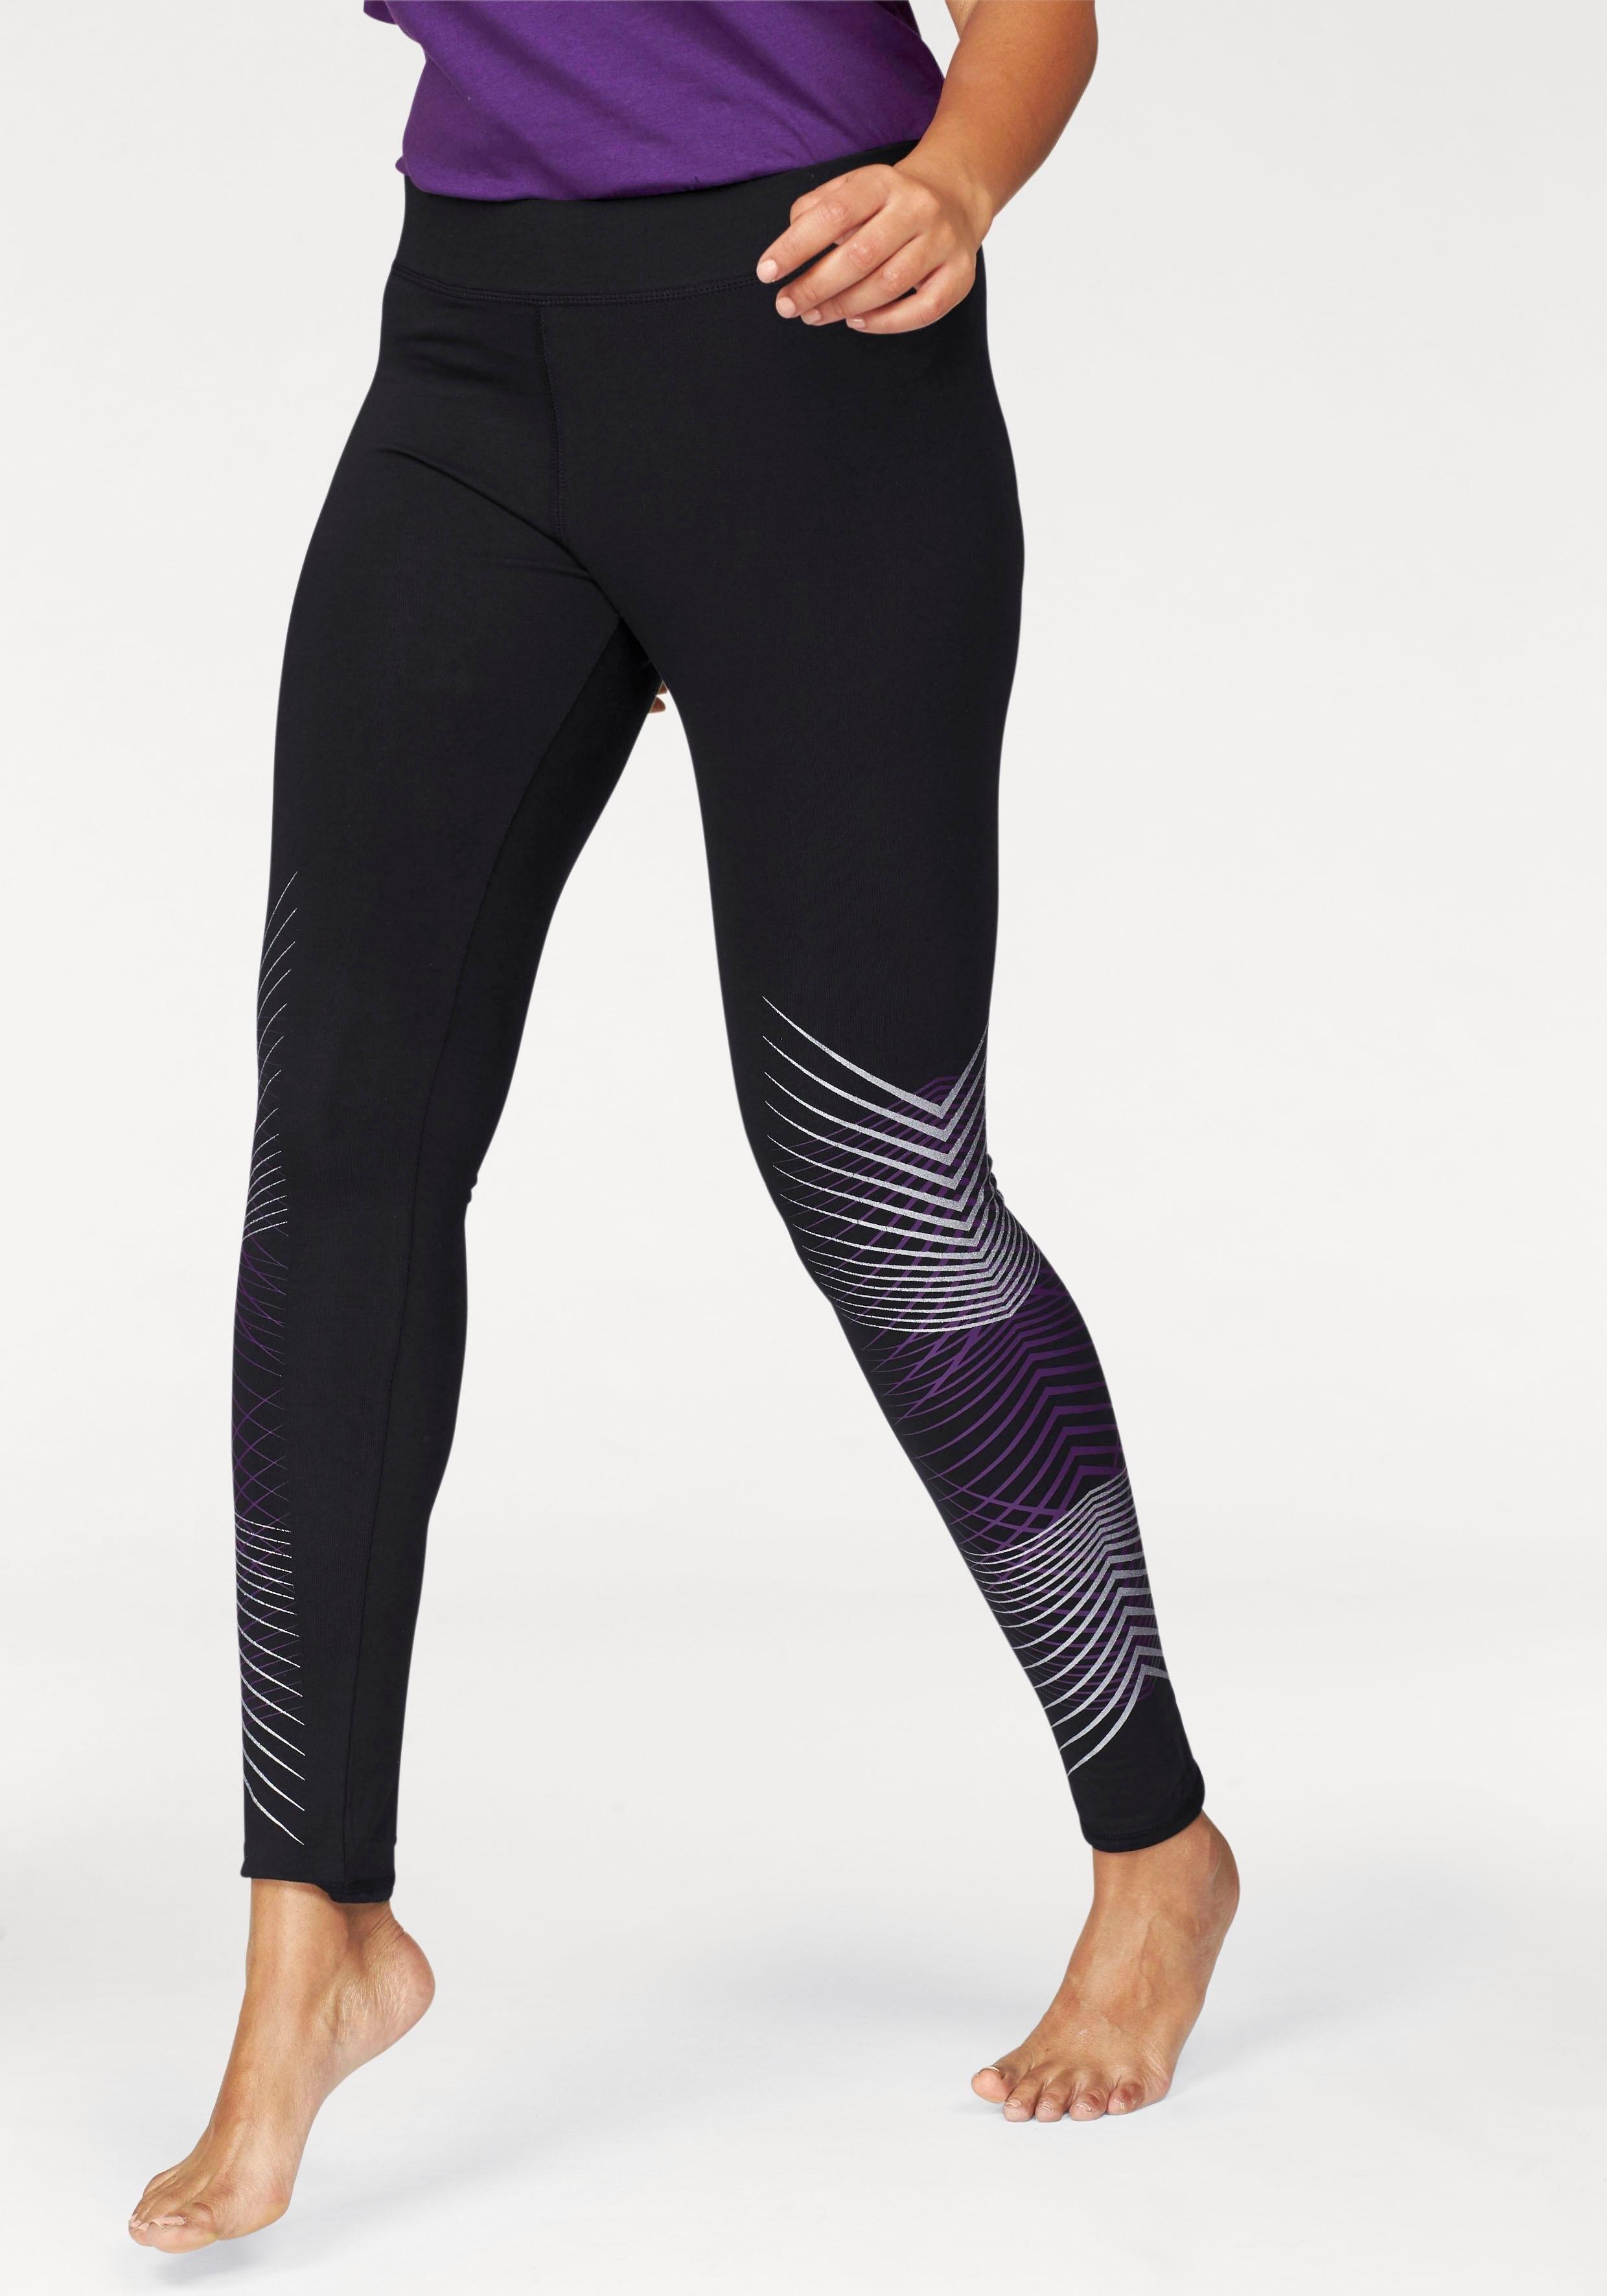 KangaROOS legging - verschillende betaalmethodes